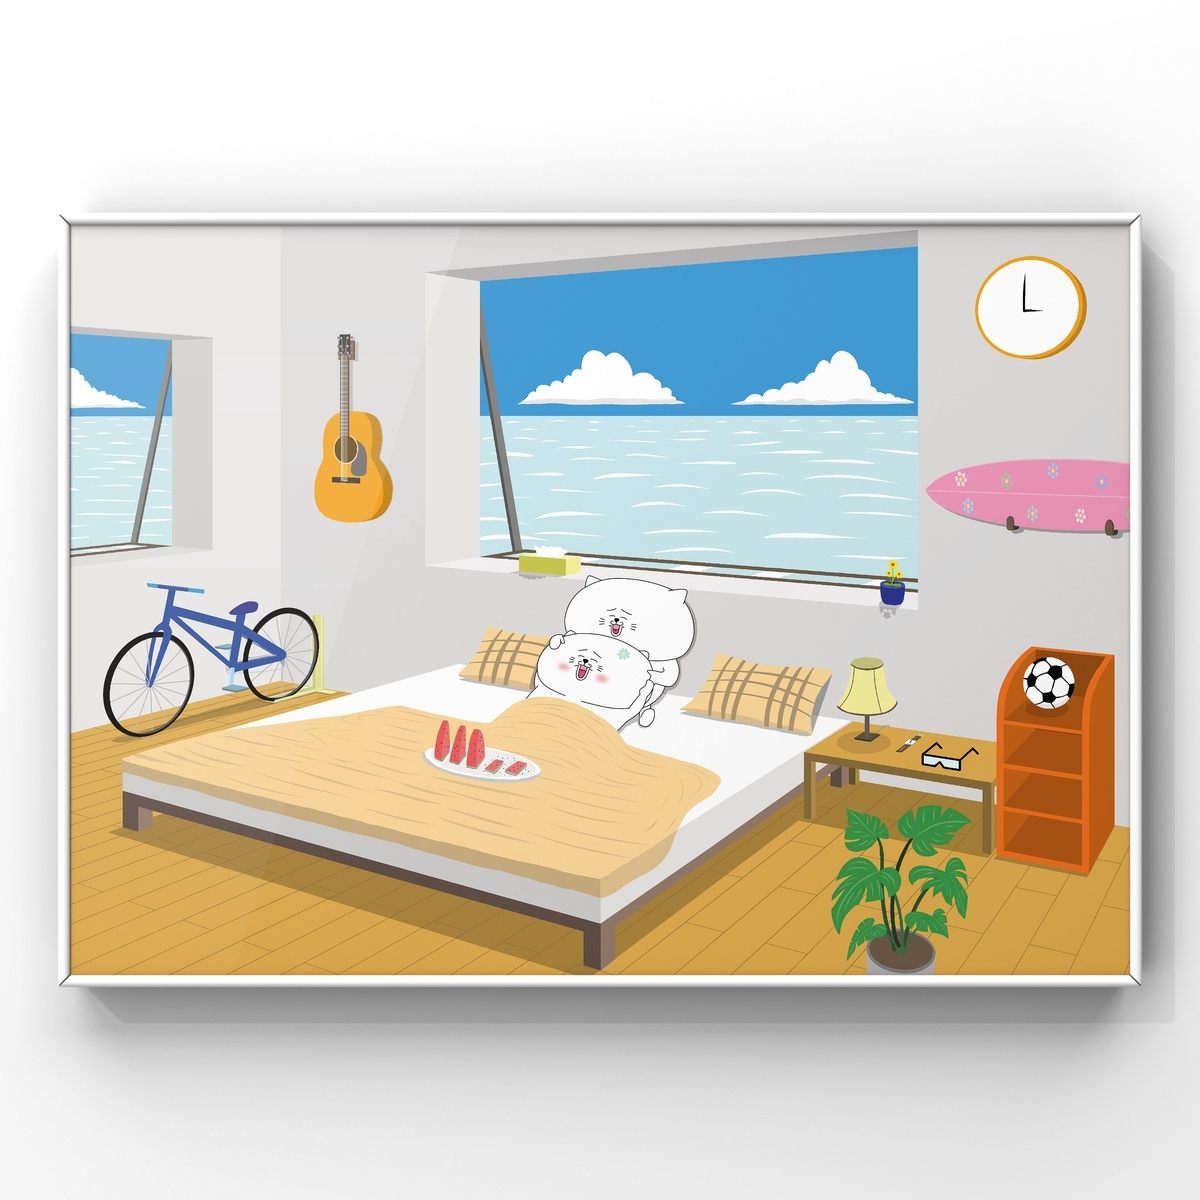 f:id:yoshisumi3:20200912165356j:plain